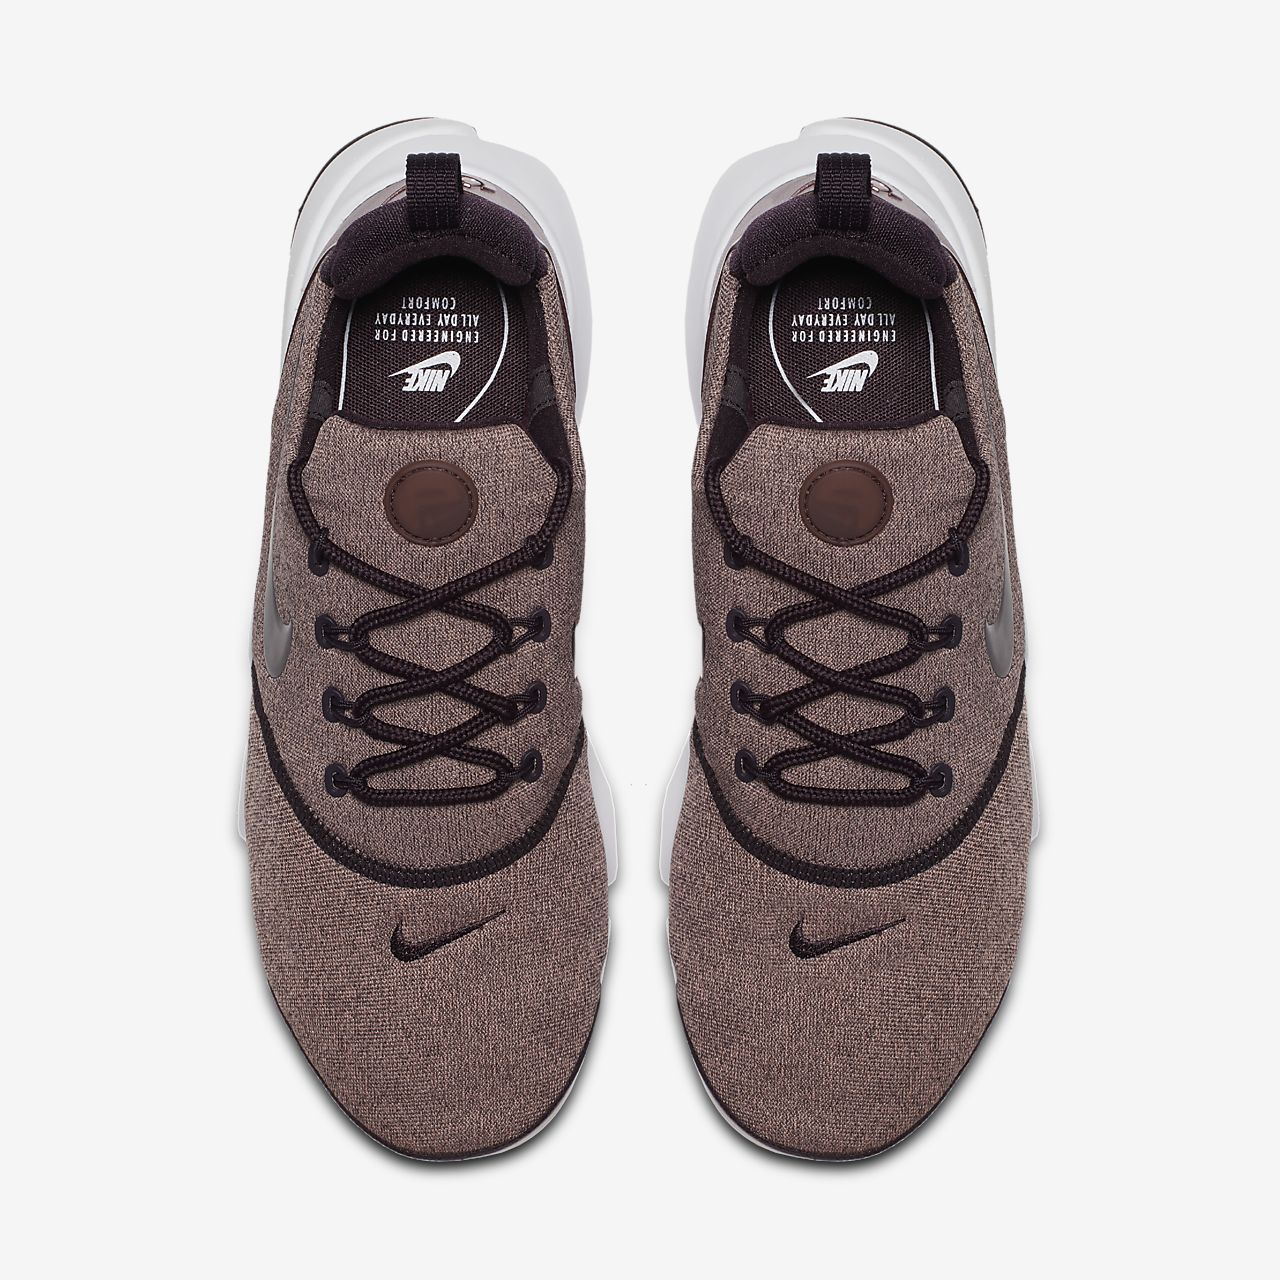 Nike Presto Fly Fly Fly SE Damenschuh    | Verschiedene Waren  f91be9